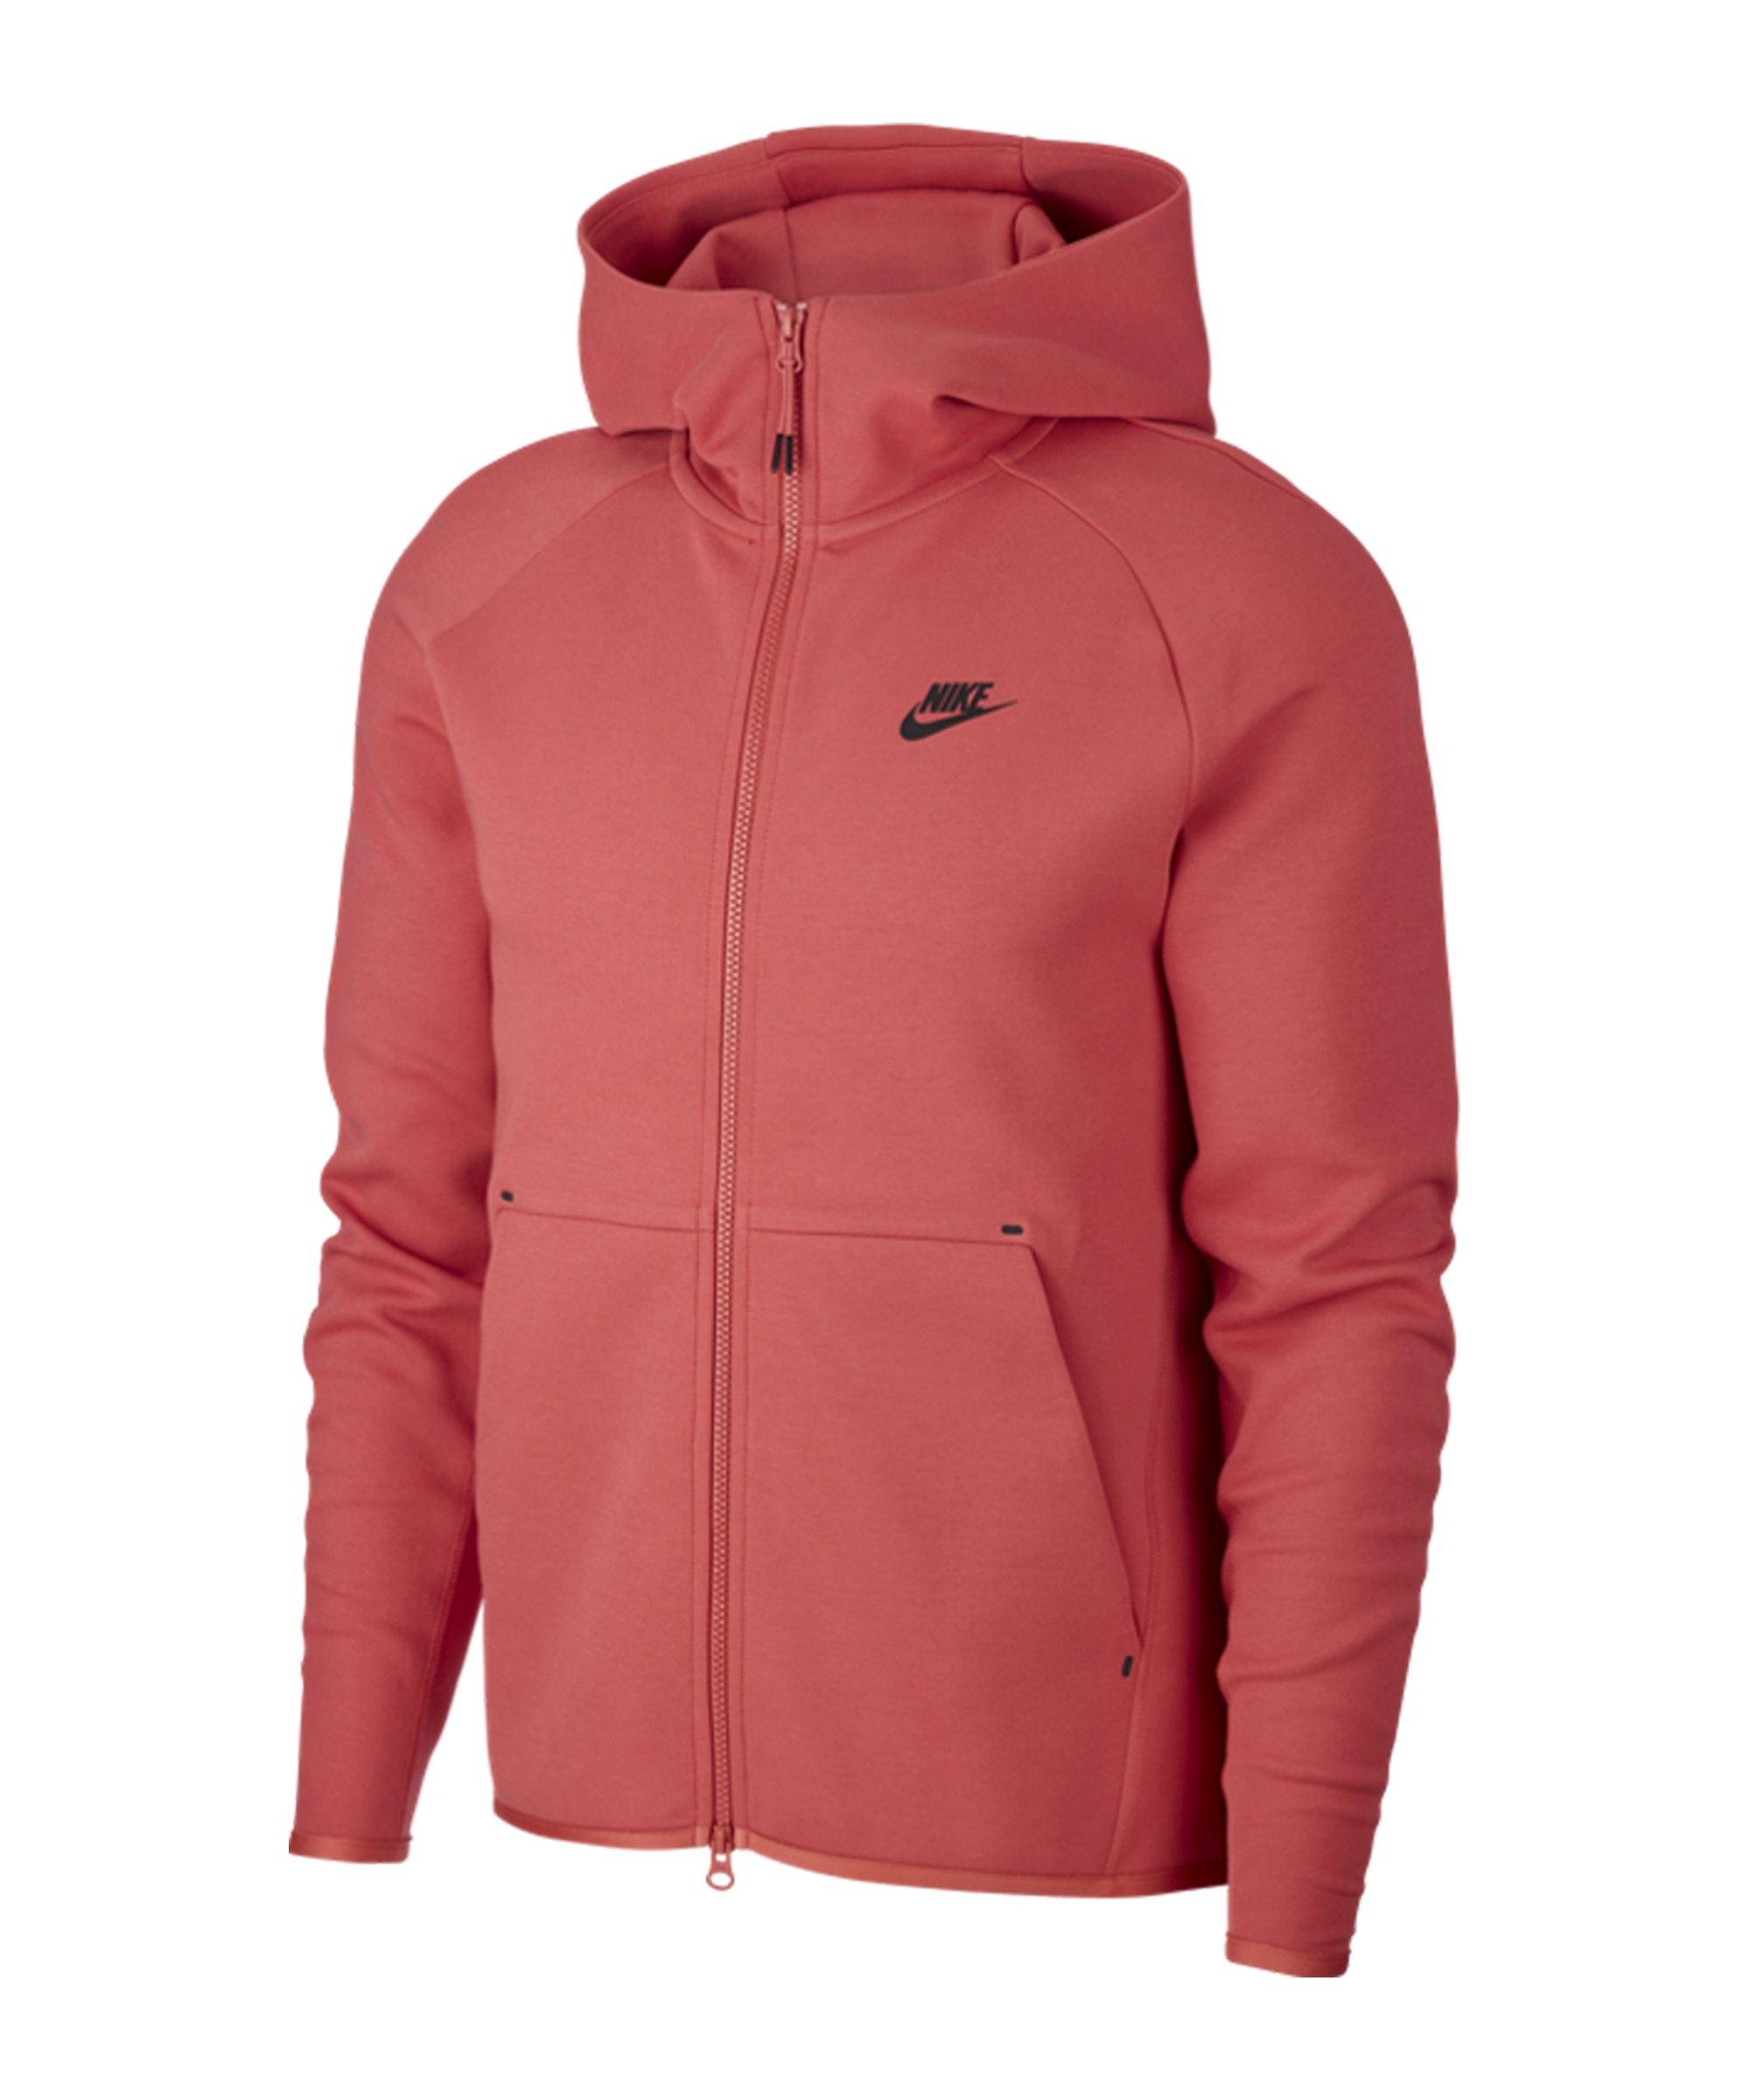 Nike Tech Fleece Kapuzenjacke Rot F603 - rot